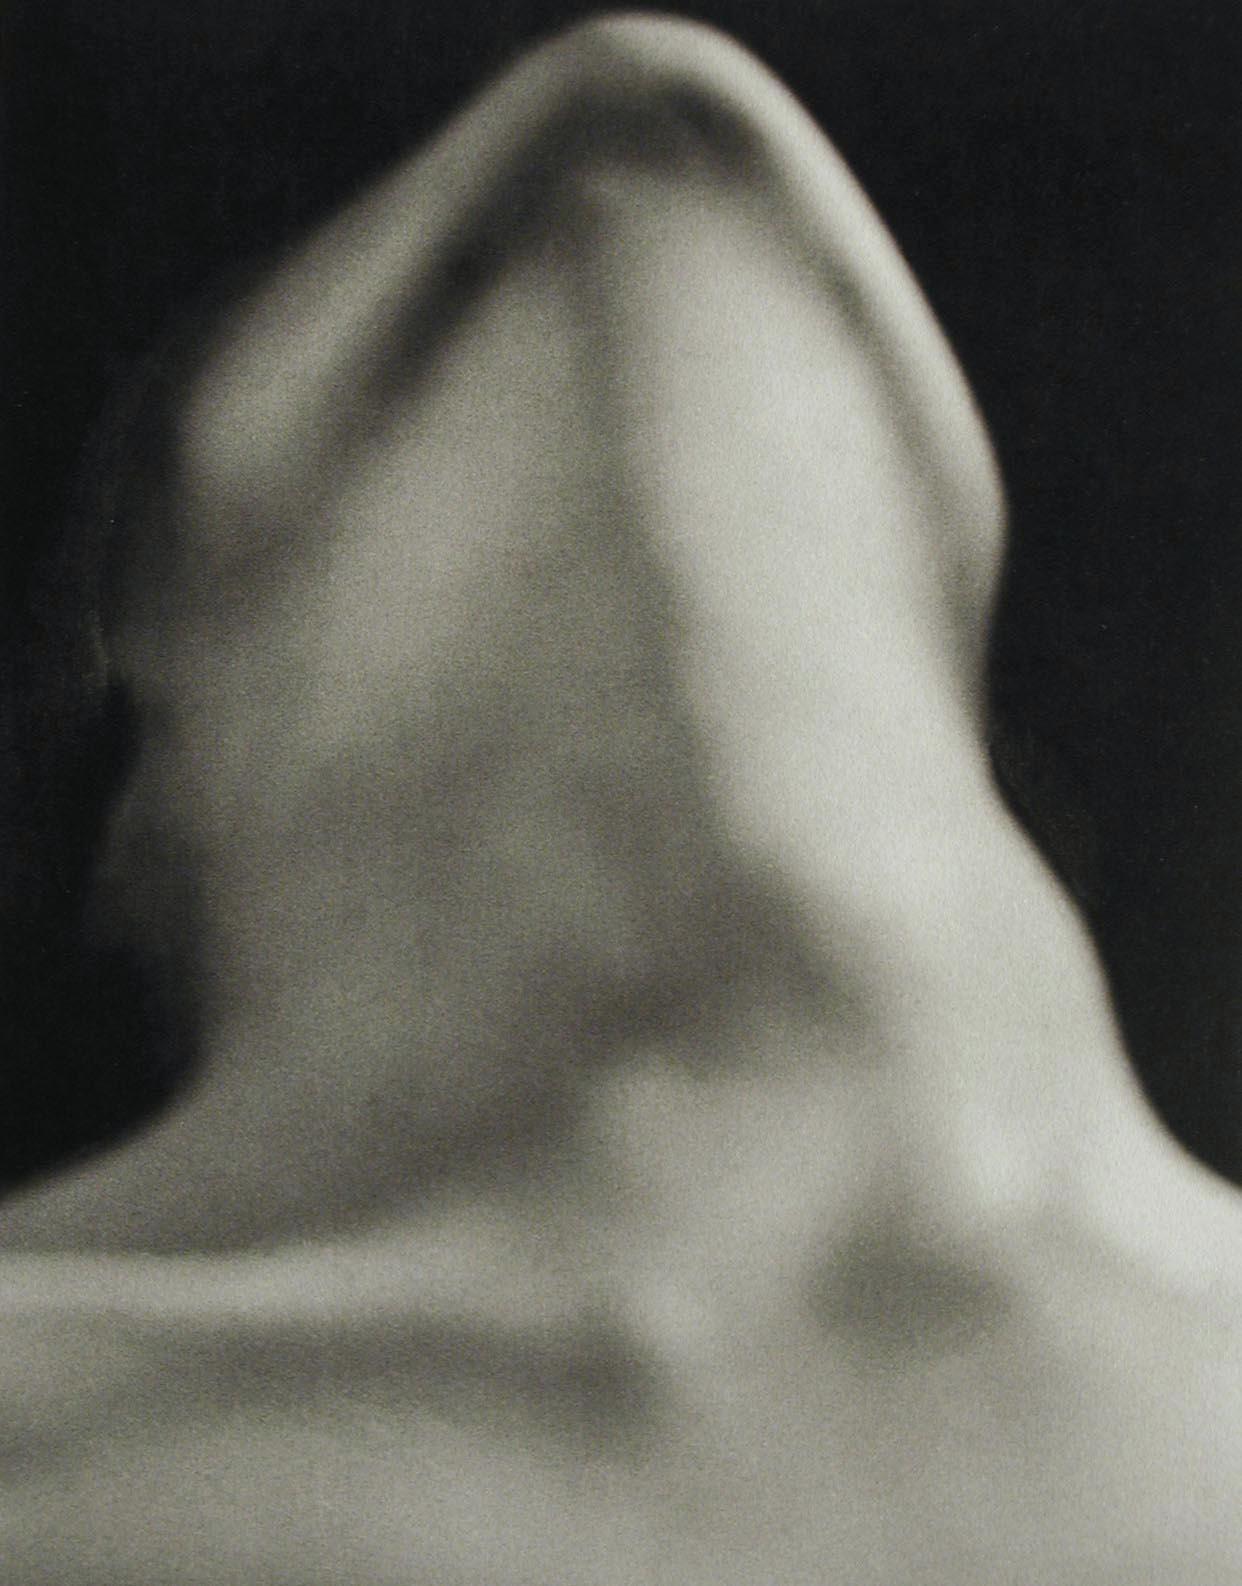 Man Ray's Anatomies (1929)